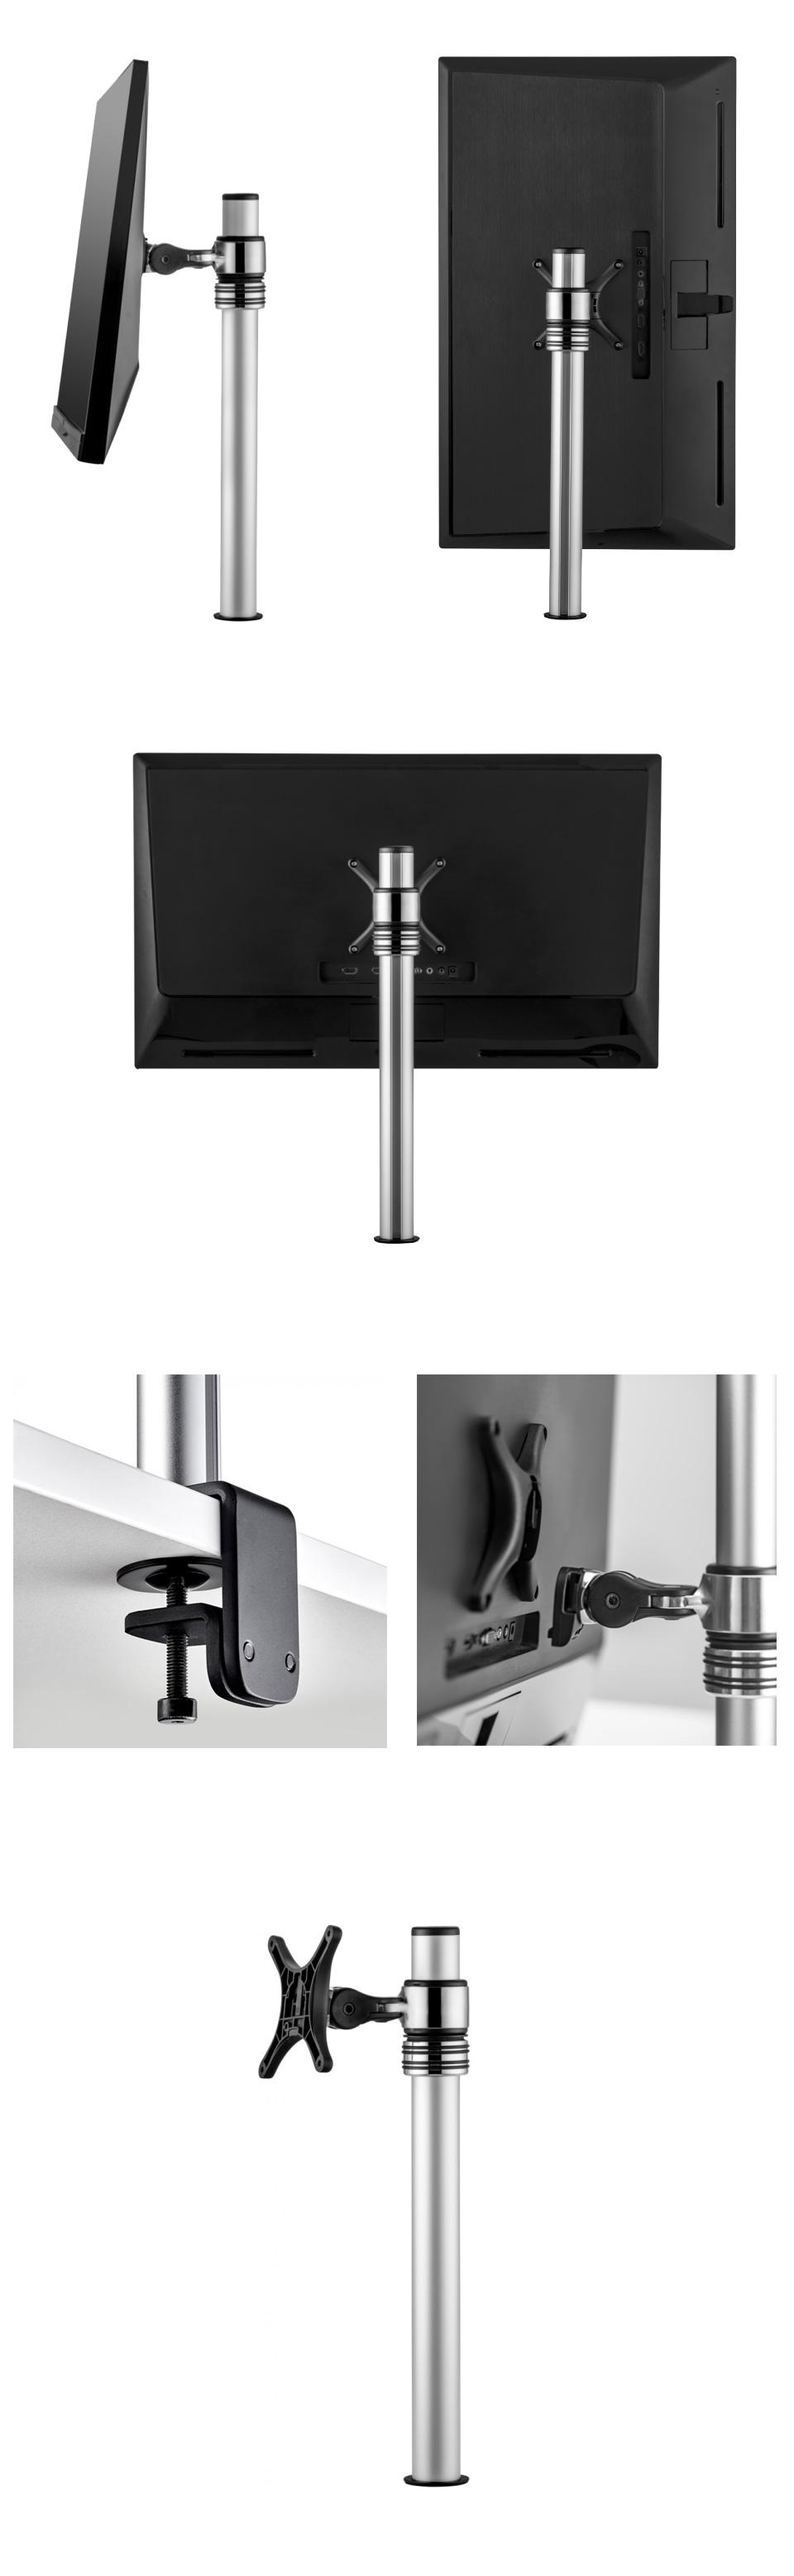 Atdec AF-M-P 440mm Micro Desktop Monitor Mount Silver product